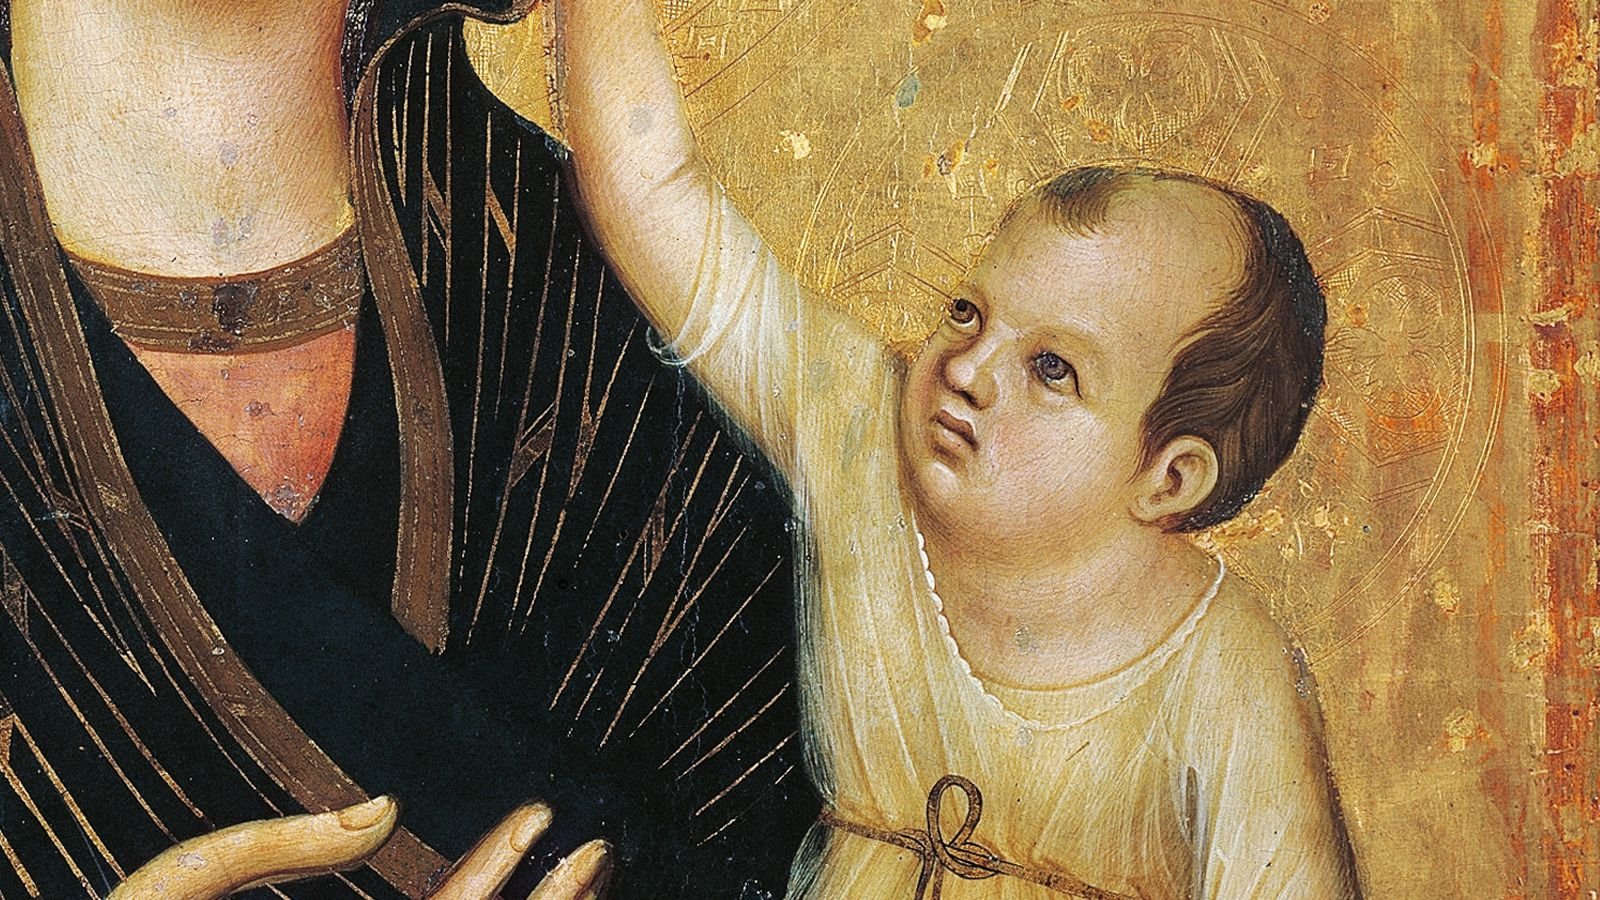 Why Babies In Medieval Paintings Look Like Ugly Old Men - Vox